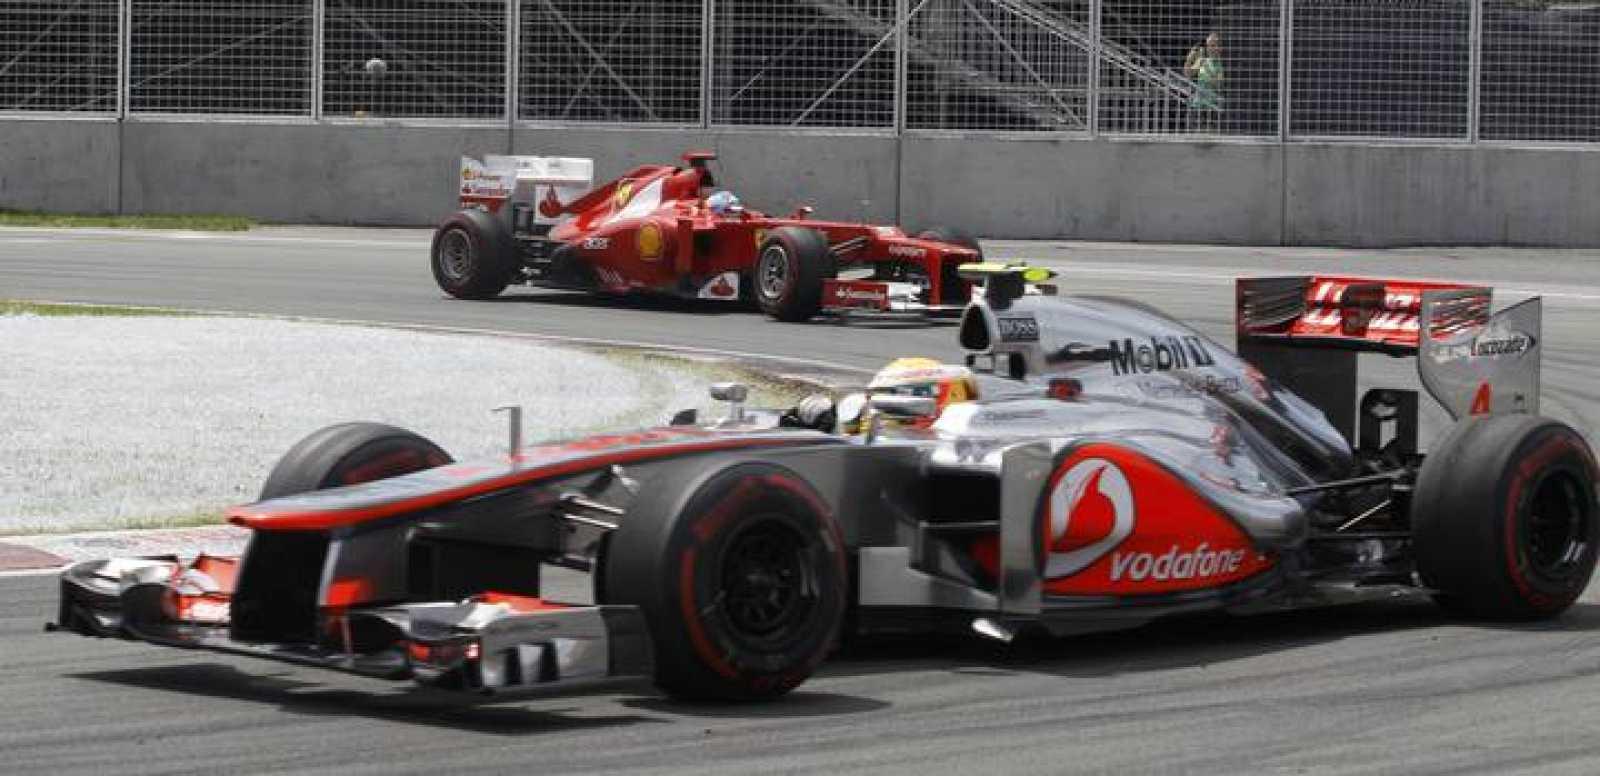 Hamilton conduce su McLaren en Canadá, seguido por Fernando Alonso con su Ferrari